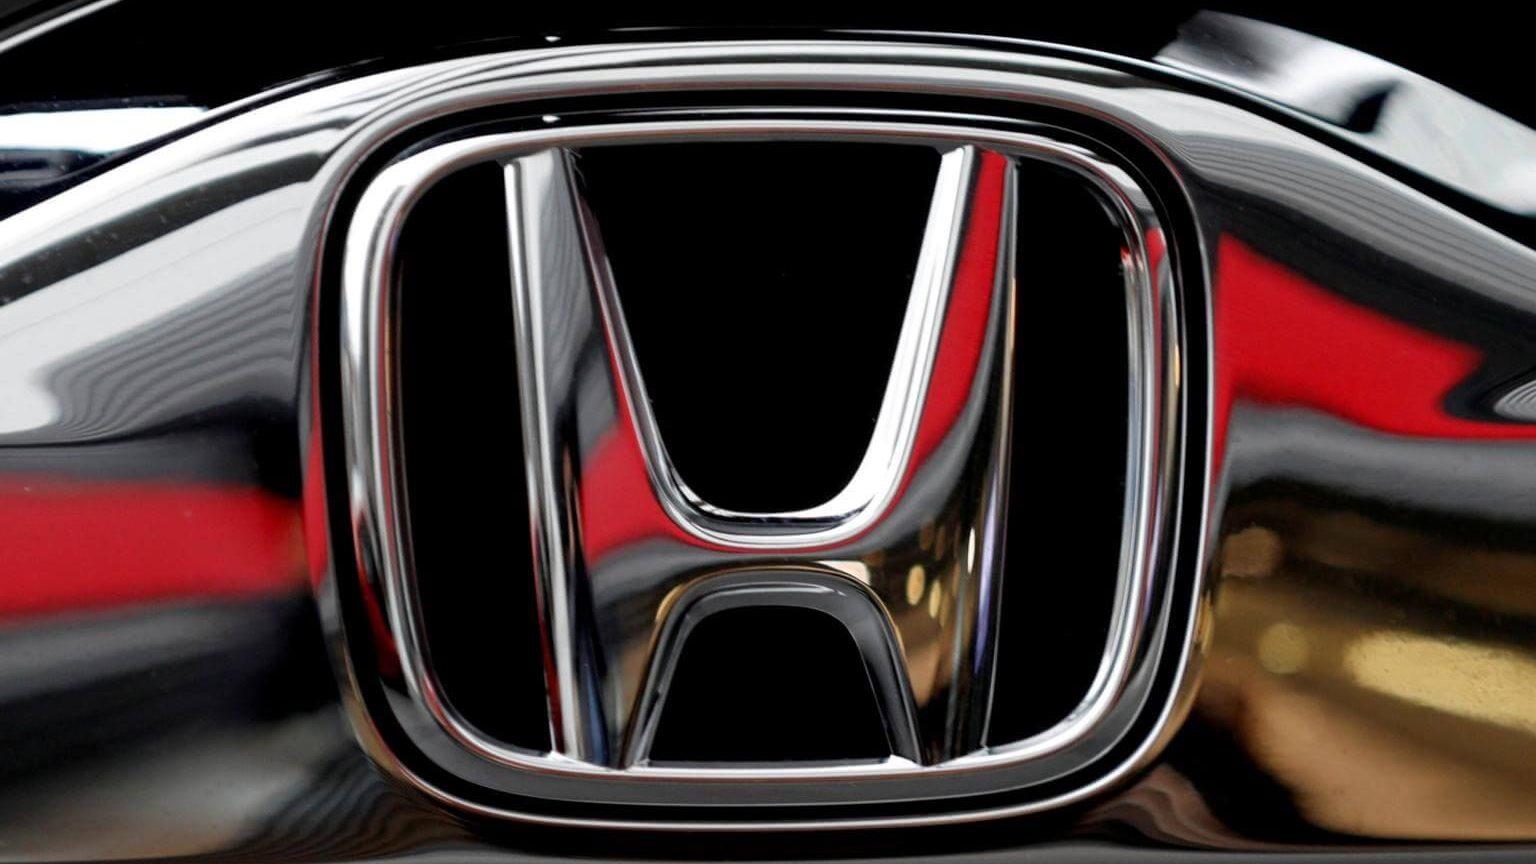 EU investiga pérdidas repentinas de control en  autos Honda Accord